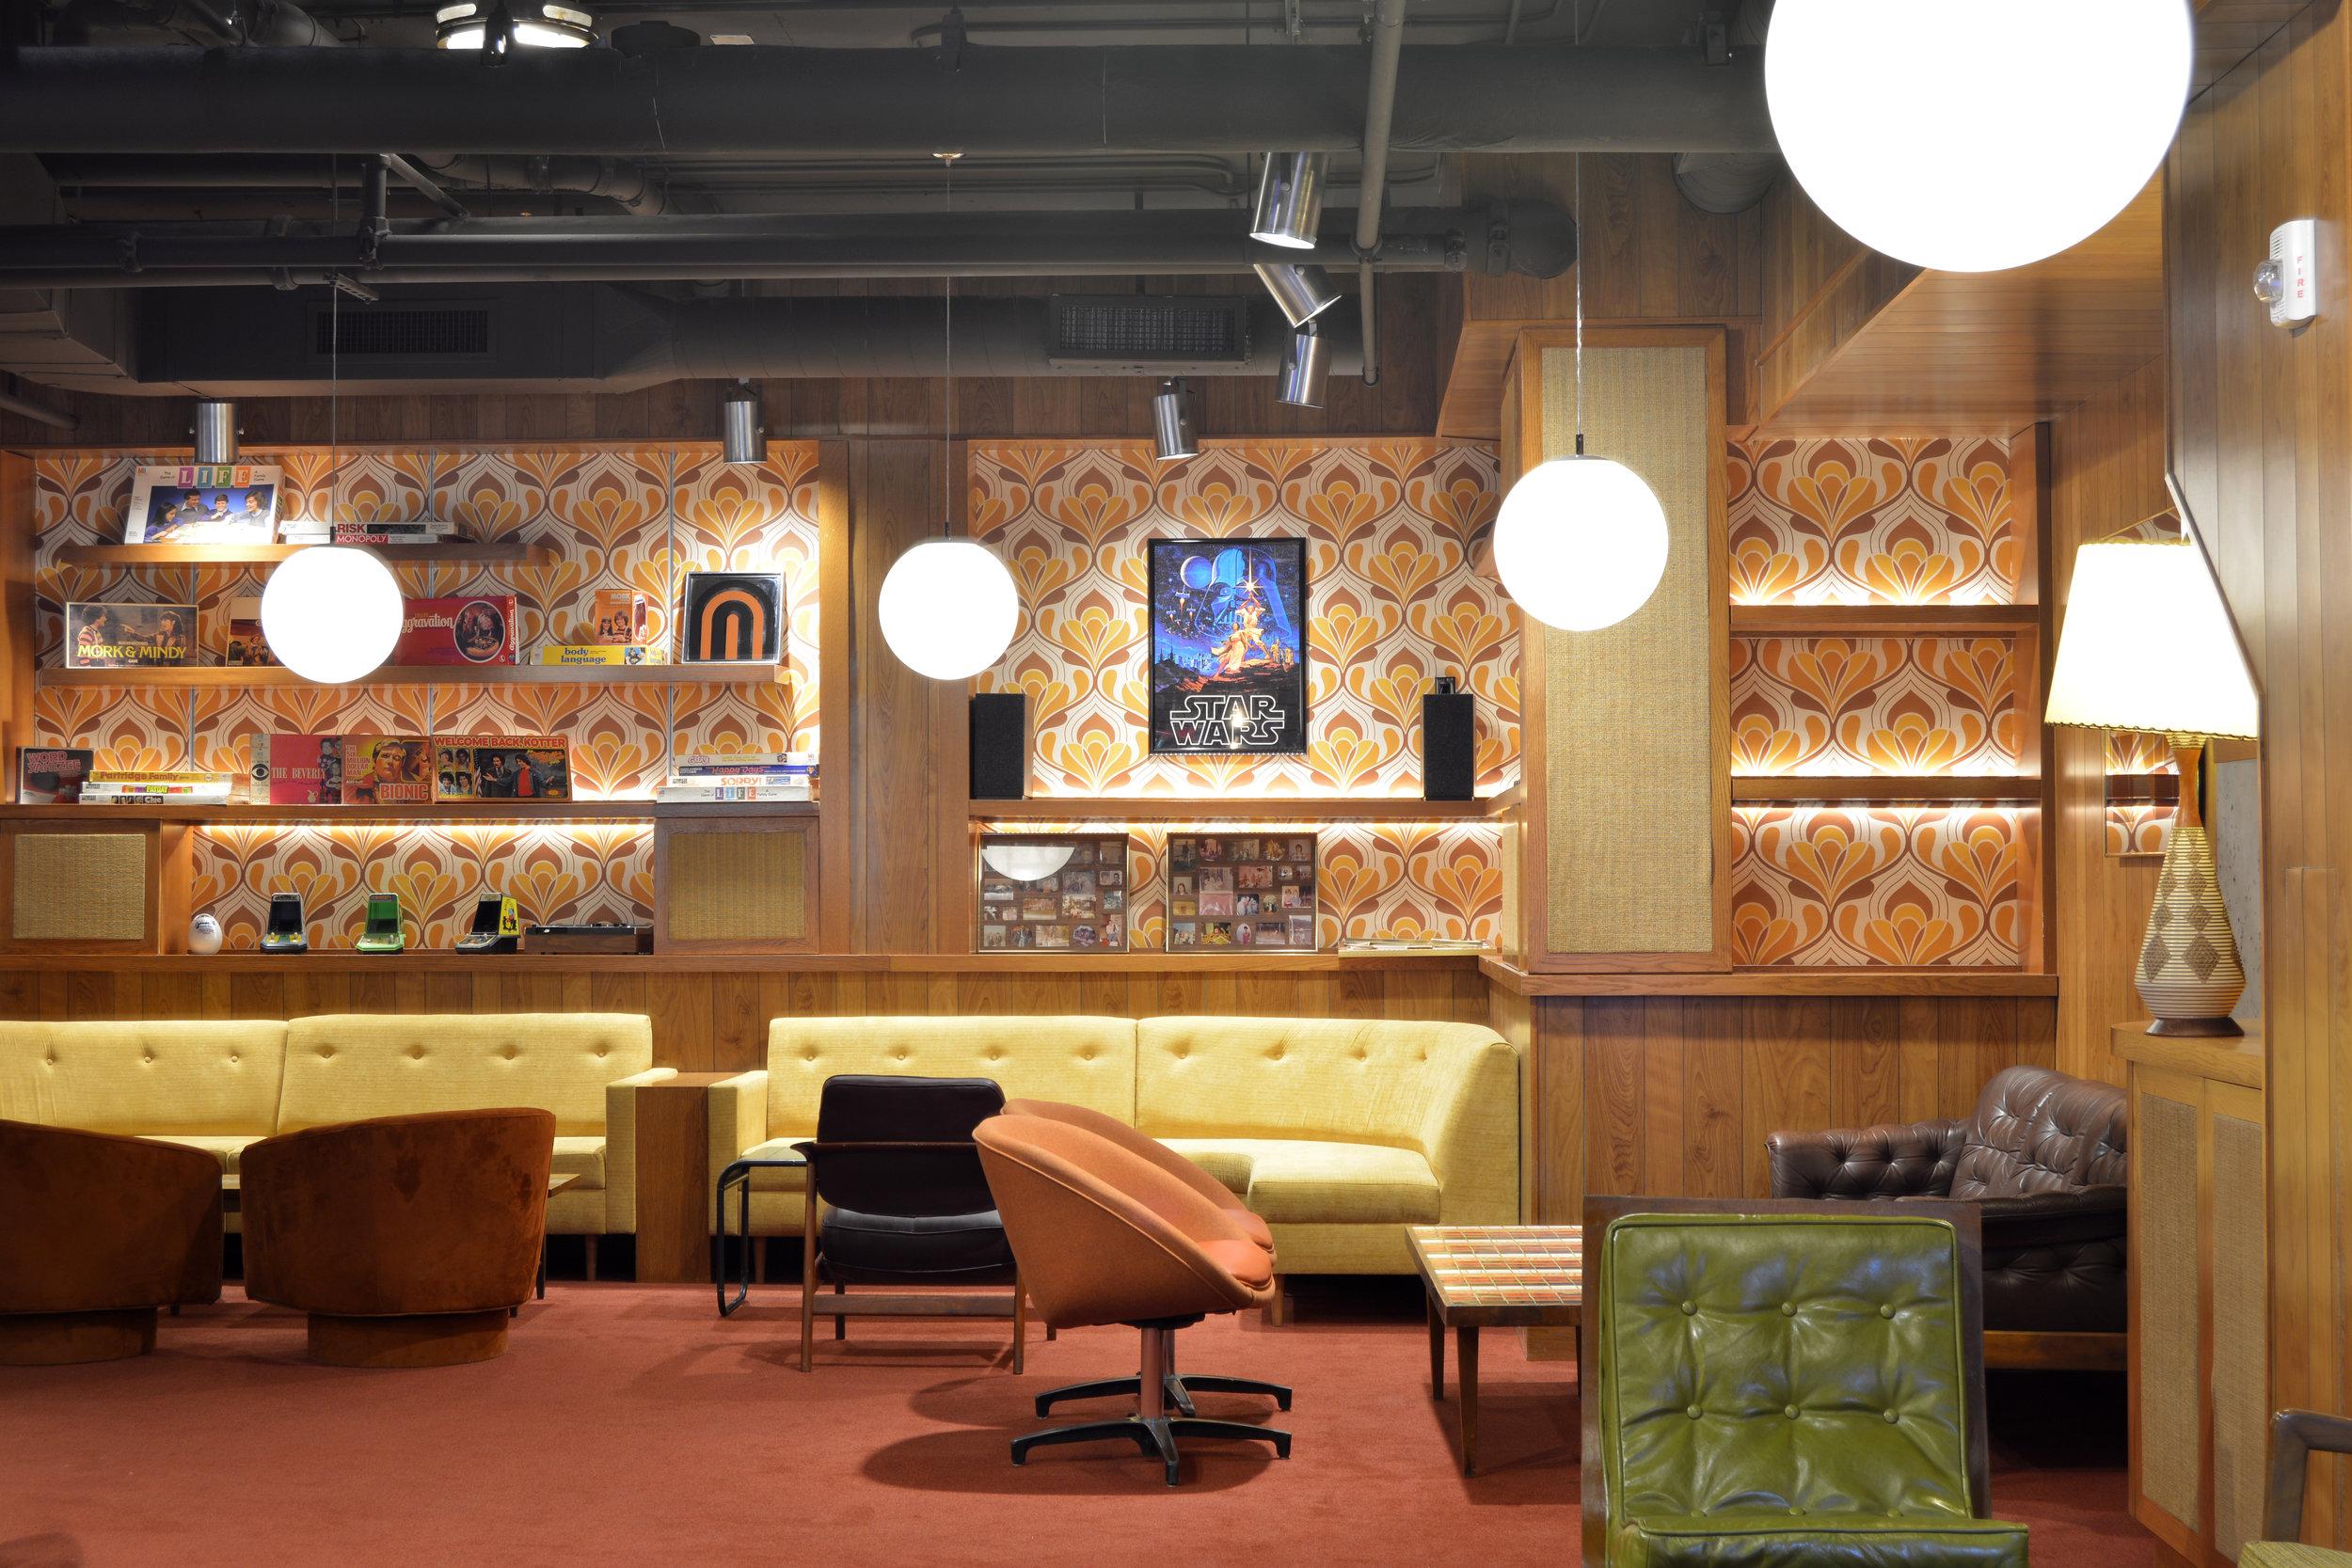 studio-saint-bars-and-restaurants-players-club-washington-dc-Wu-view1.JPG